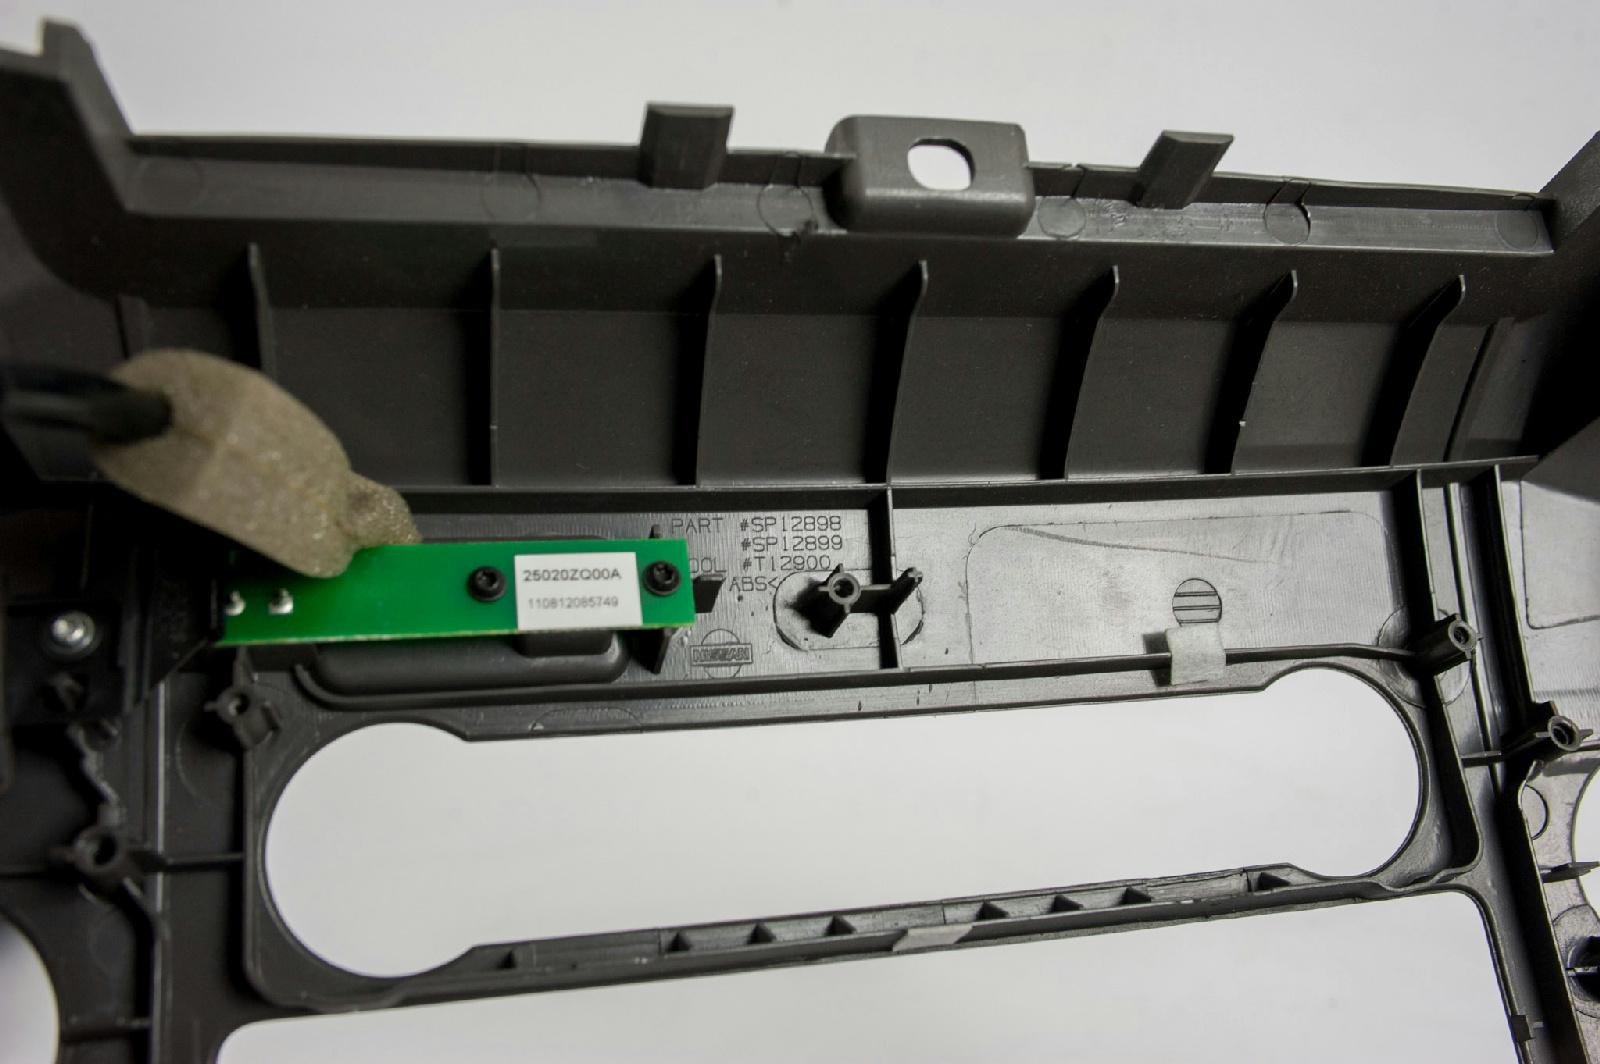 Toyota Tundra Sr5 Headlight Diagram Free Image About Wiring Diagram